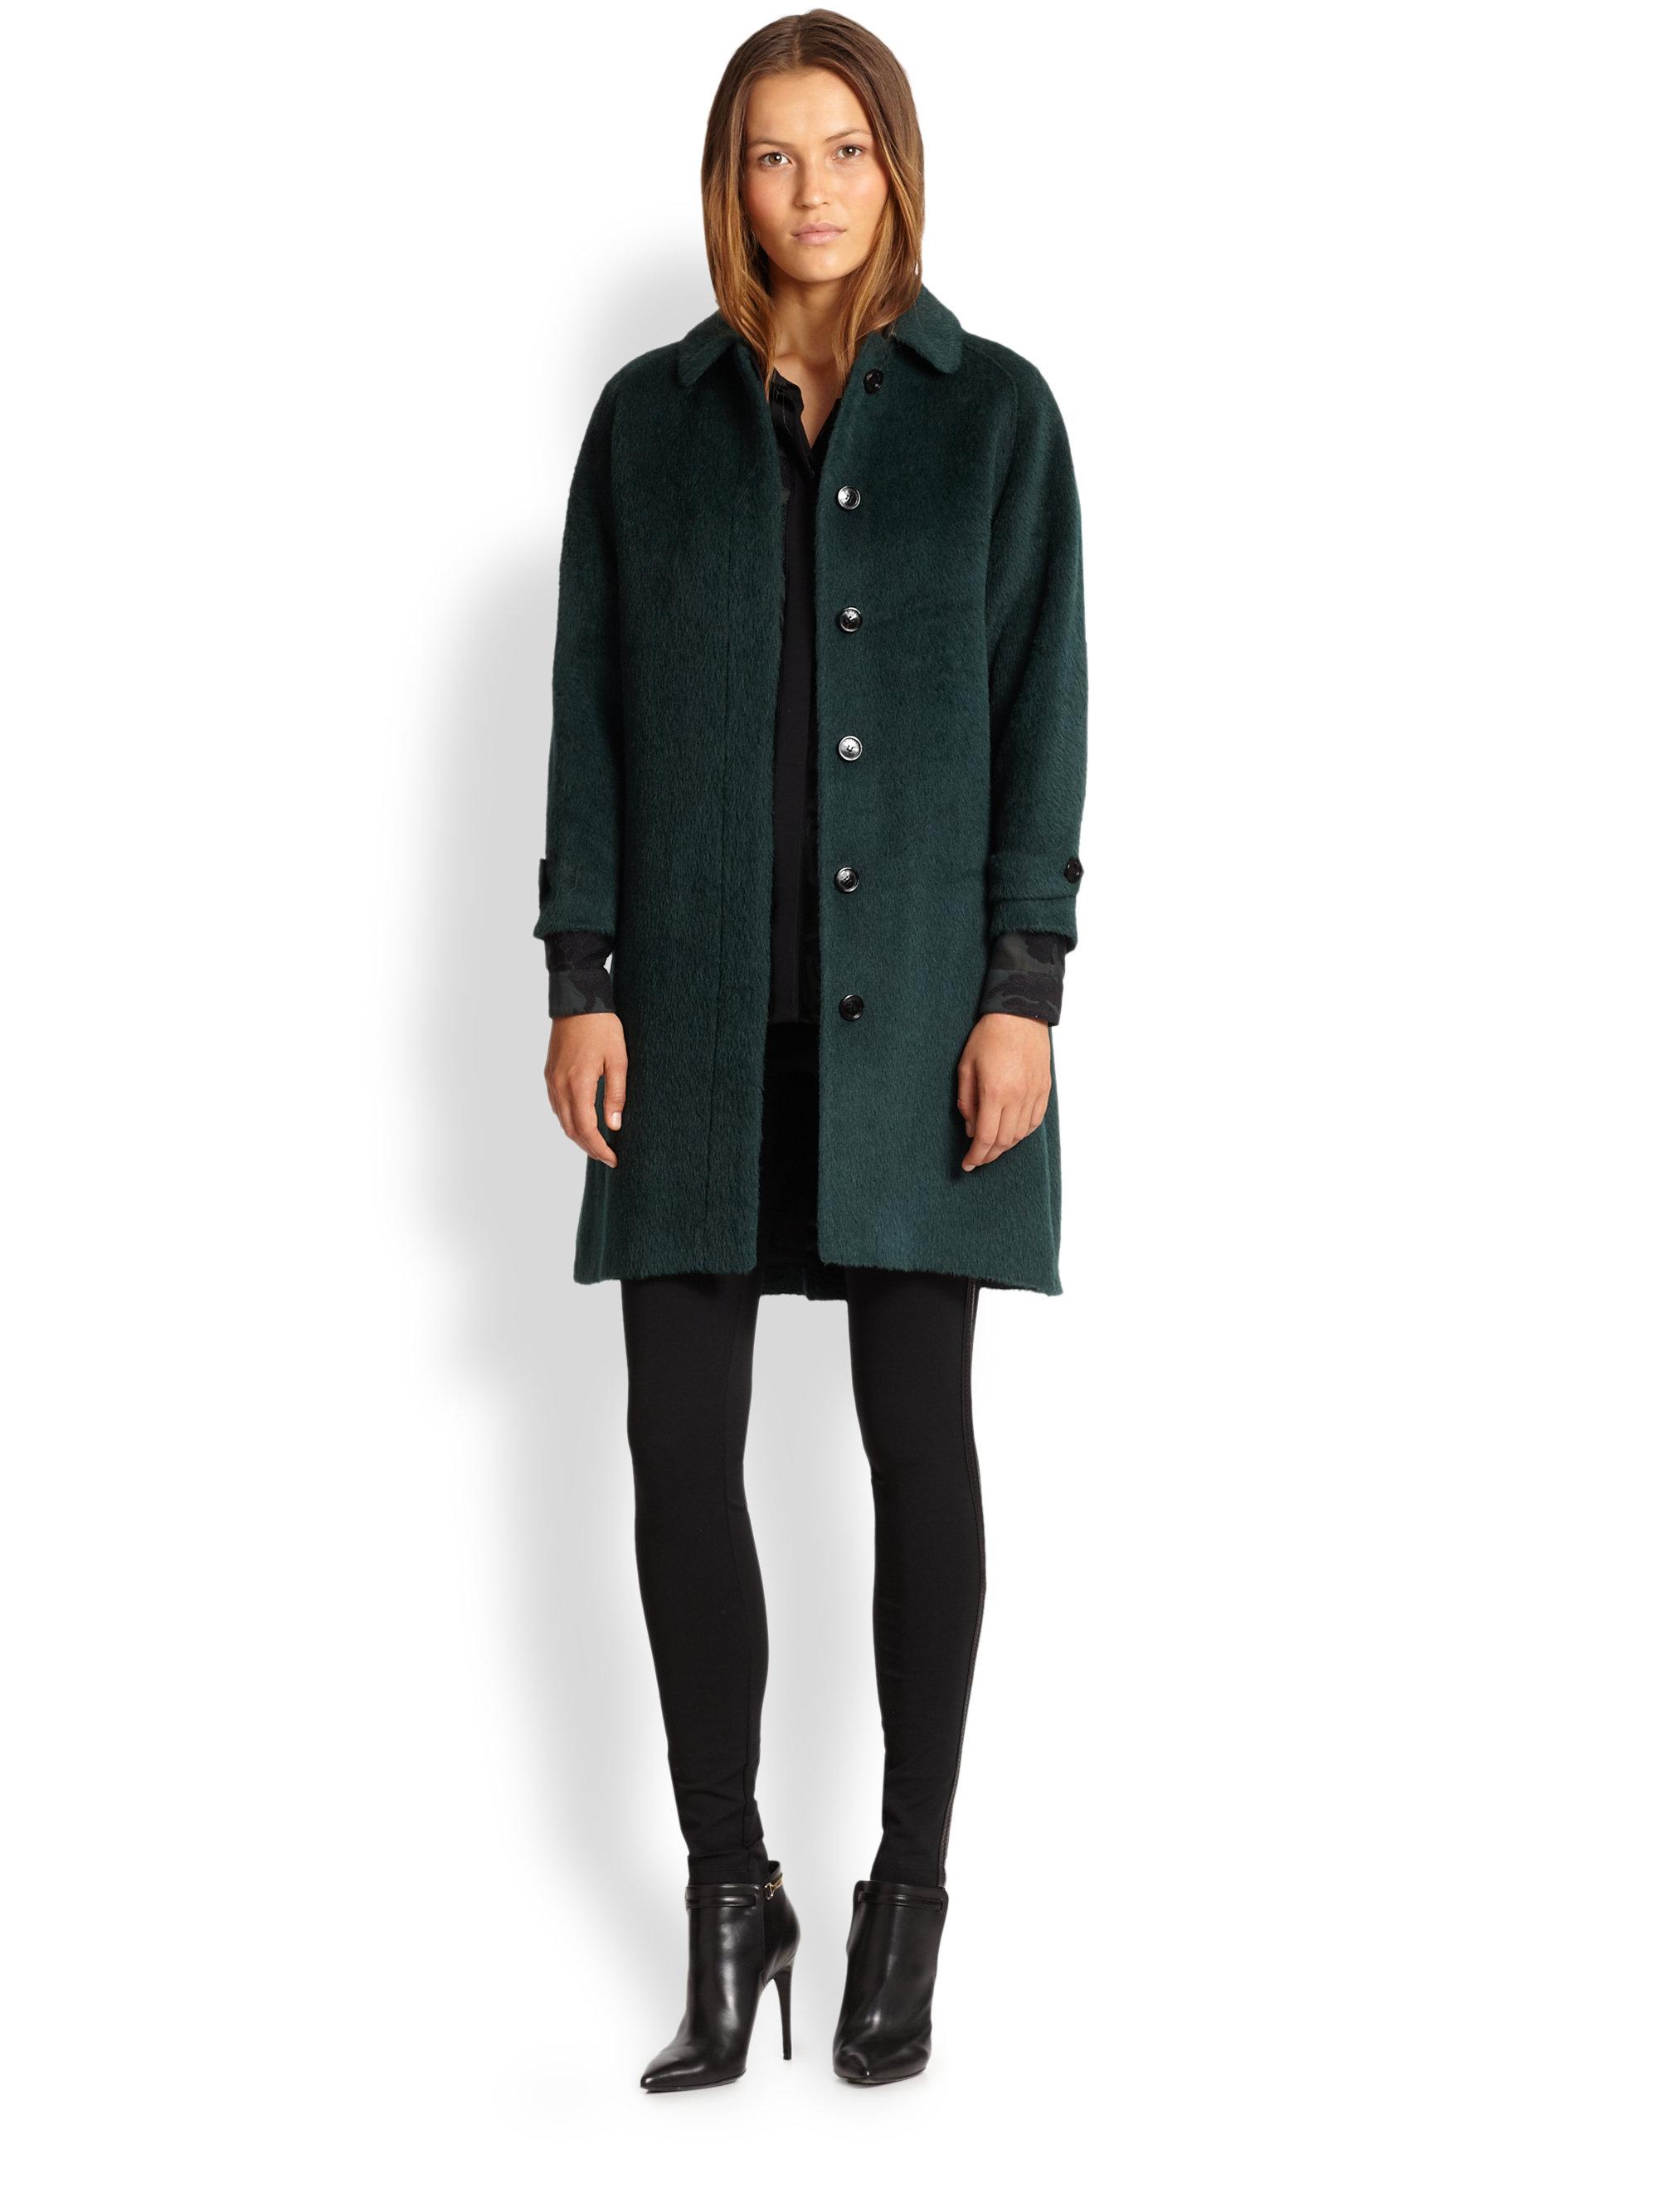 Fresh Lyst - Burberry Cartington Alpaca Wool Coat in Green TT08